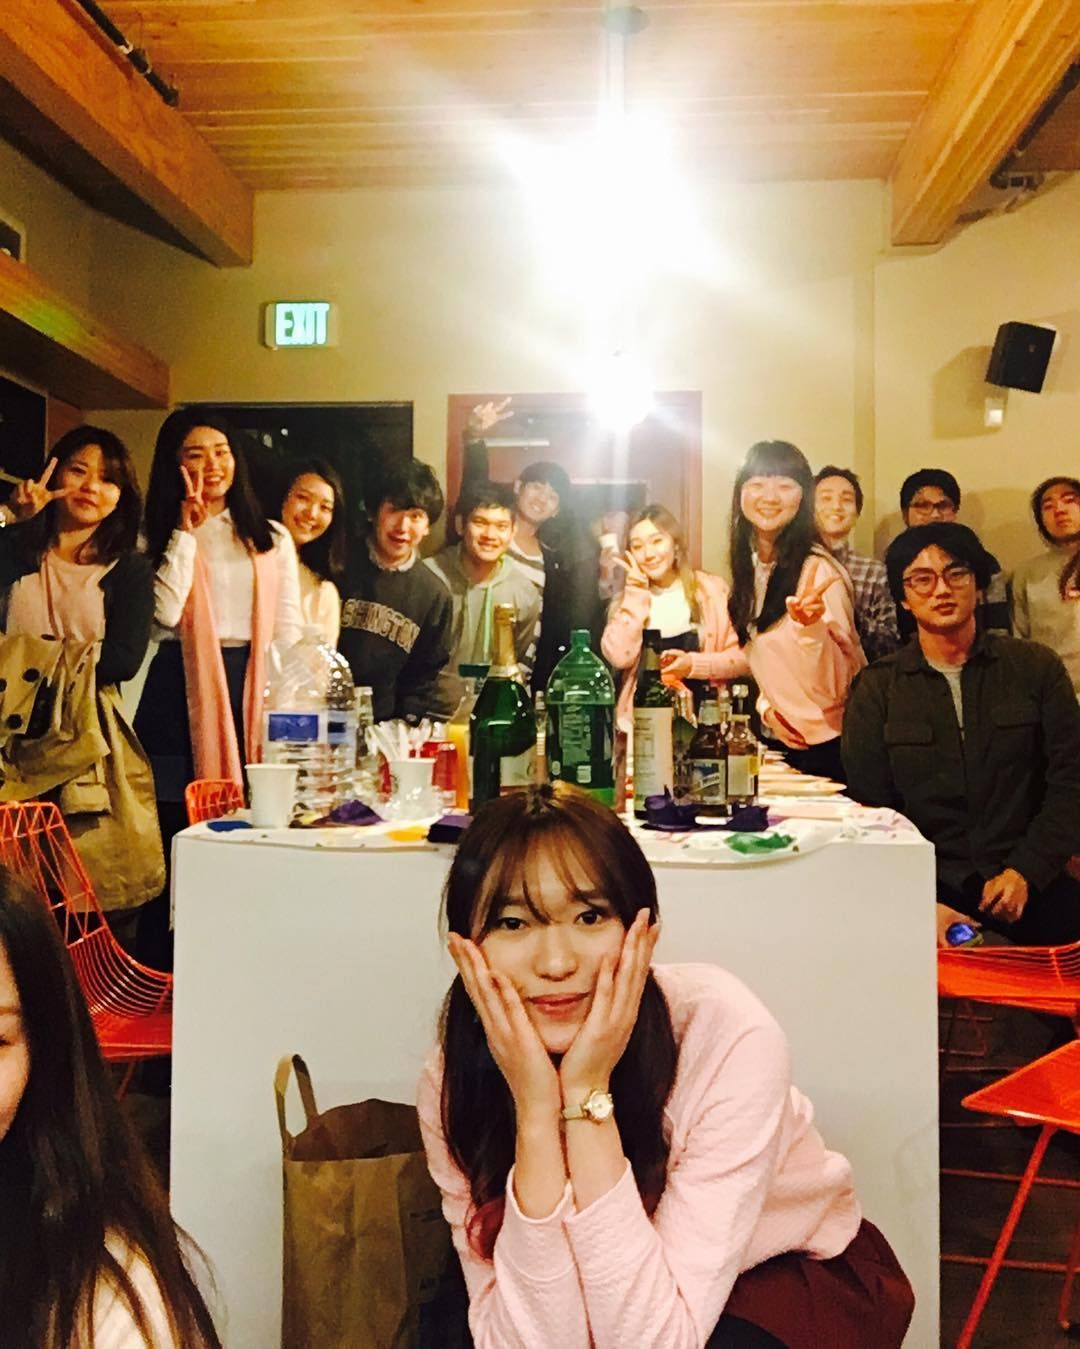 Mar 10 2016 Ending Quarter Party  . Where is Kana...?? . #uw #spring #springquarter #studyabroad #washington #friends #friendship #daily #유덥 #스프링쿼터 #유학 #워싱턴 #시애틀 #seattle #selfie #친스타그램 #일상 by ub_irene